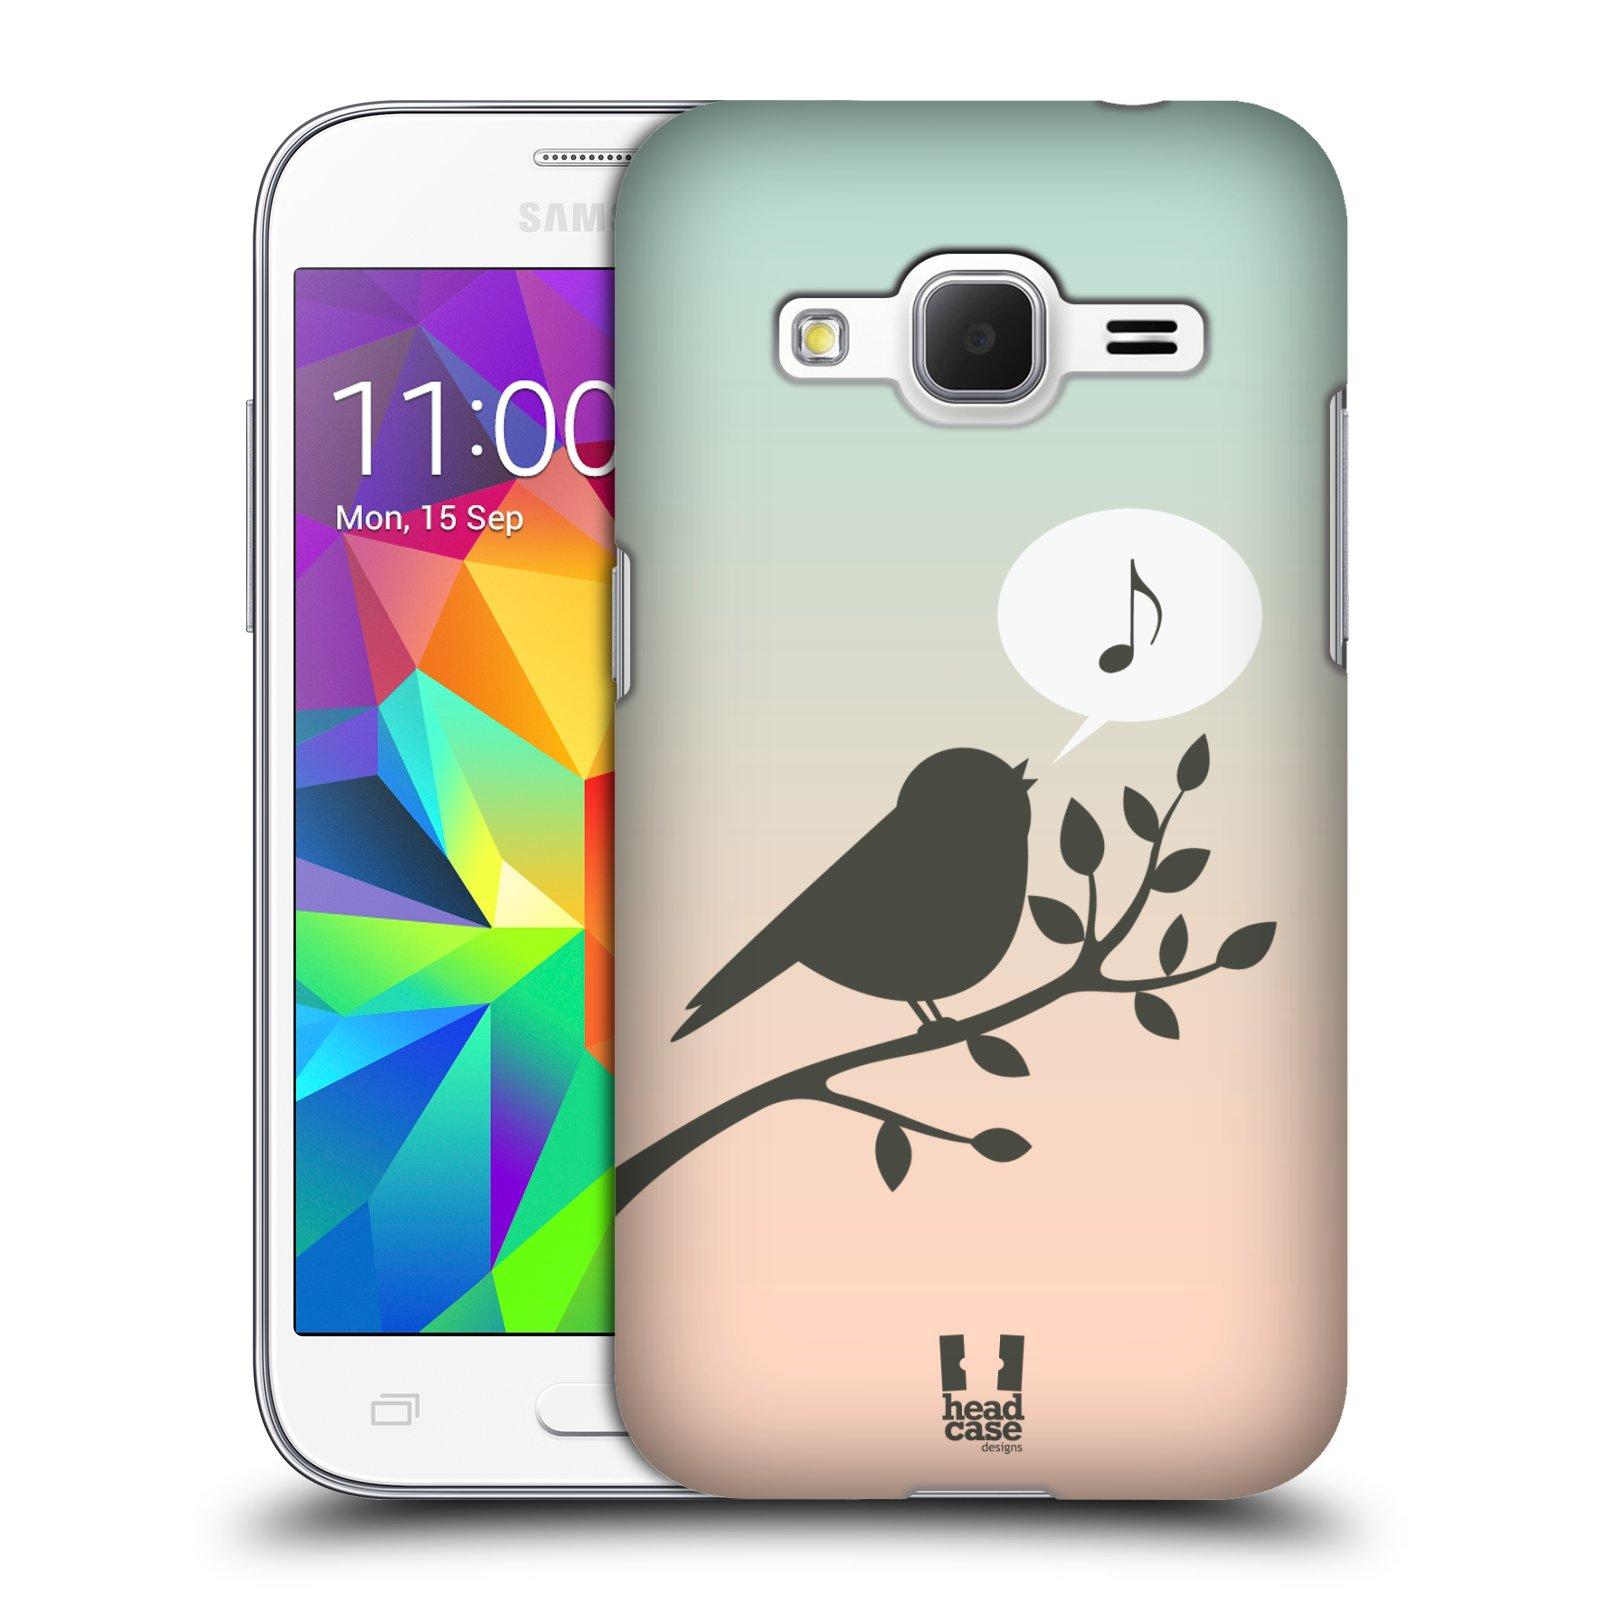 HEAD CASE plastový obal na mobil SAMSUNG GALAXY Core Prime (Core Prime VE) vzor Ptáček zpěváček noty píseň